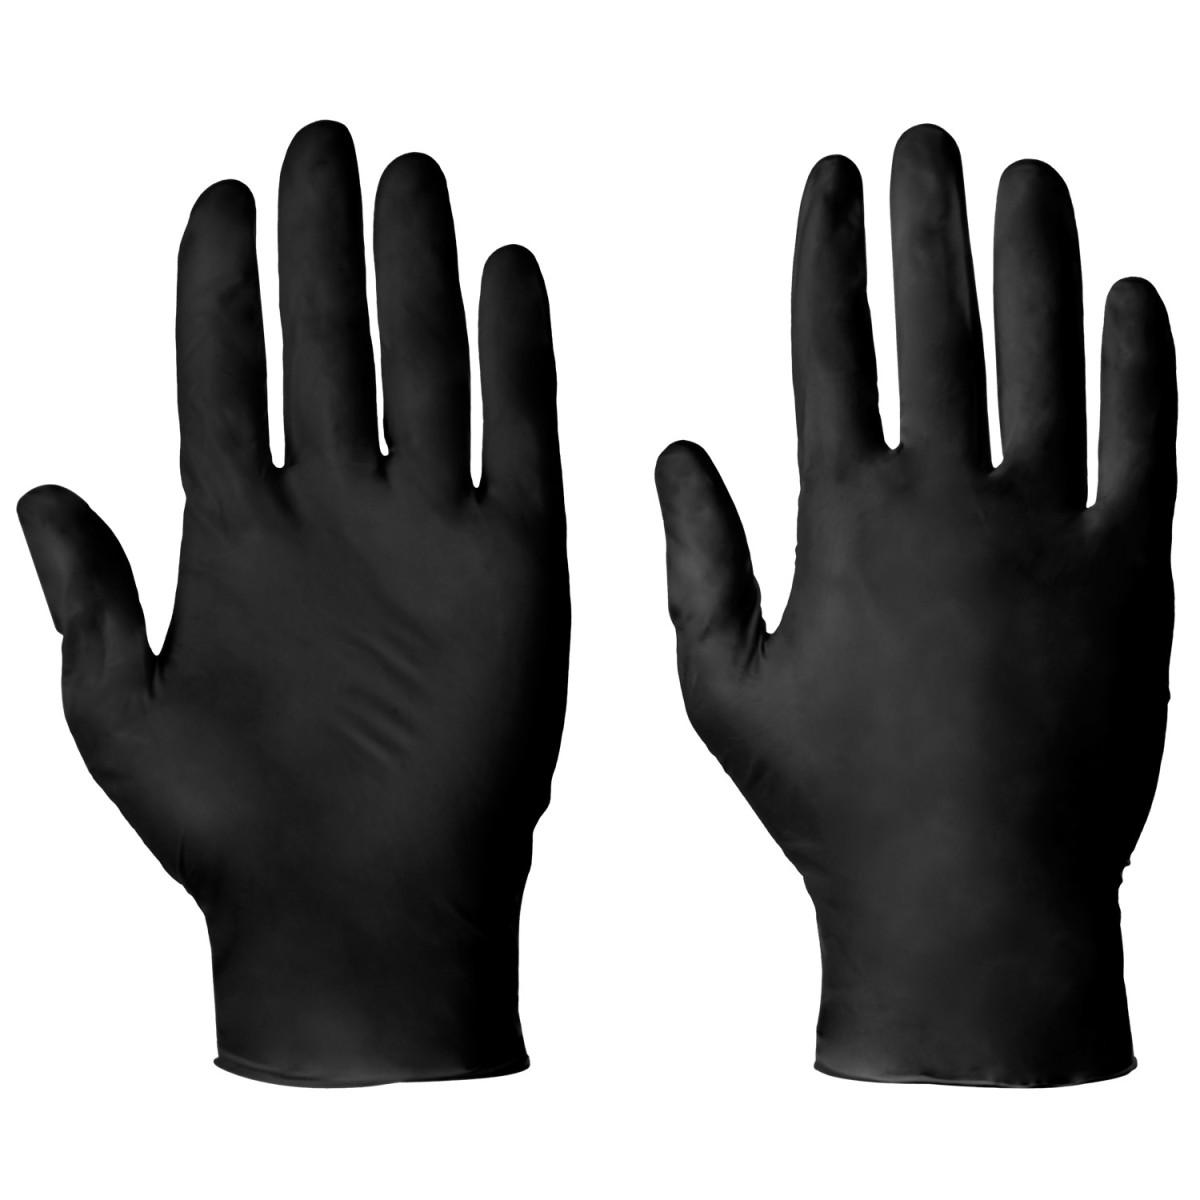 Nitrile Examination Gloves Black 100 pcs